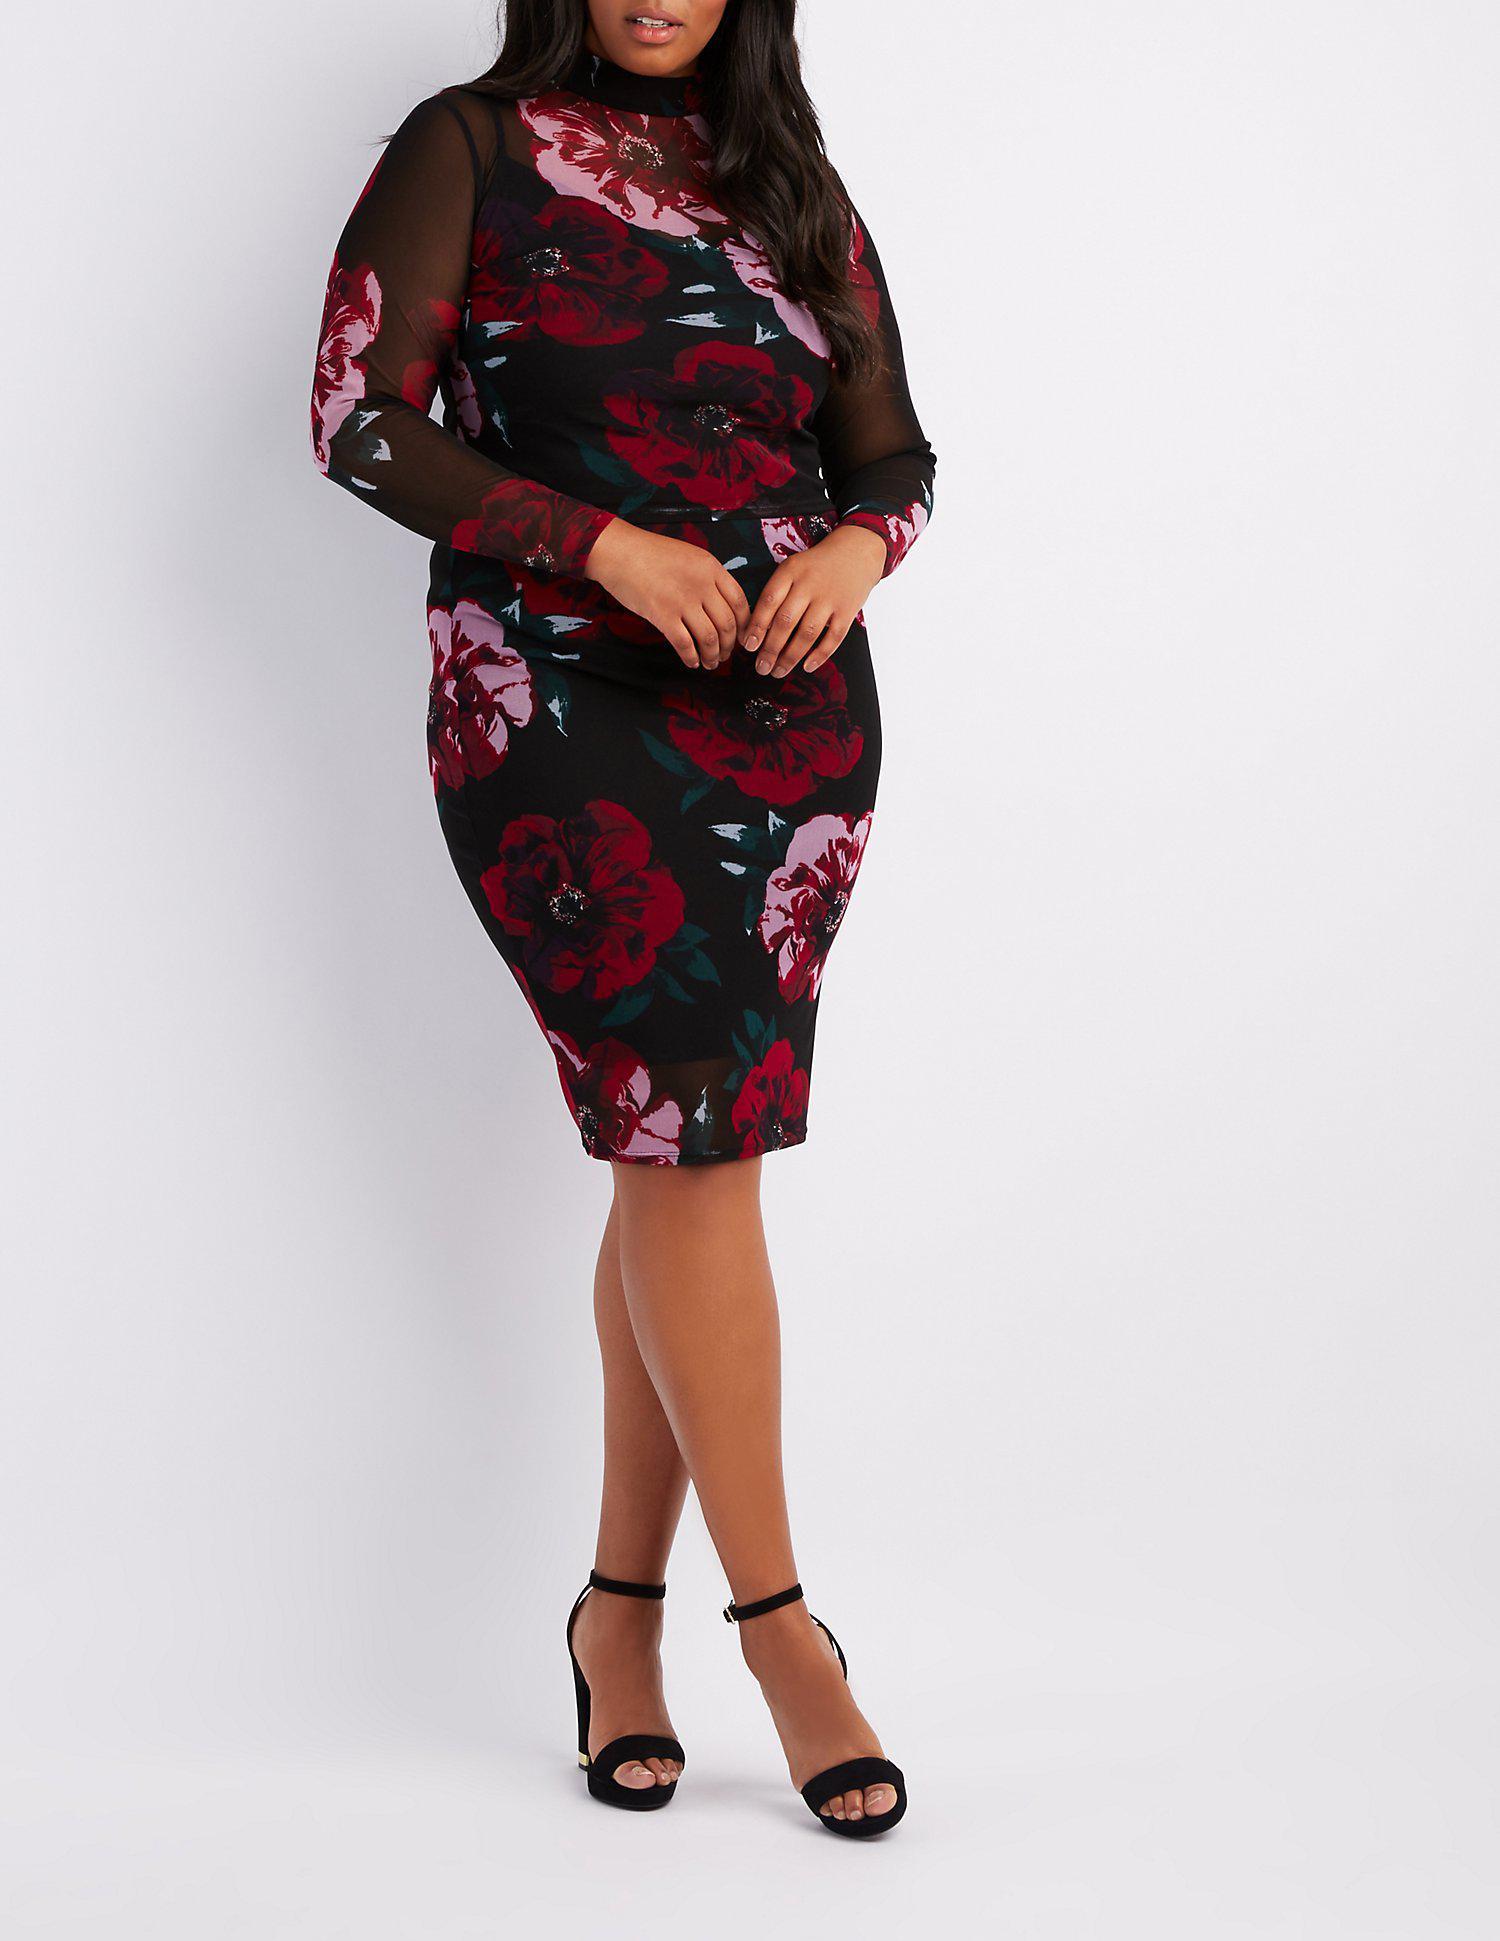 7c407a4df84 Lyst - Charlotte Russe Plus Size Floral Mesh Crop Top in Black